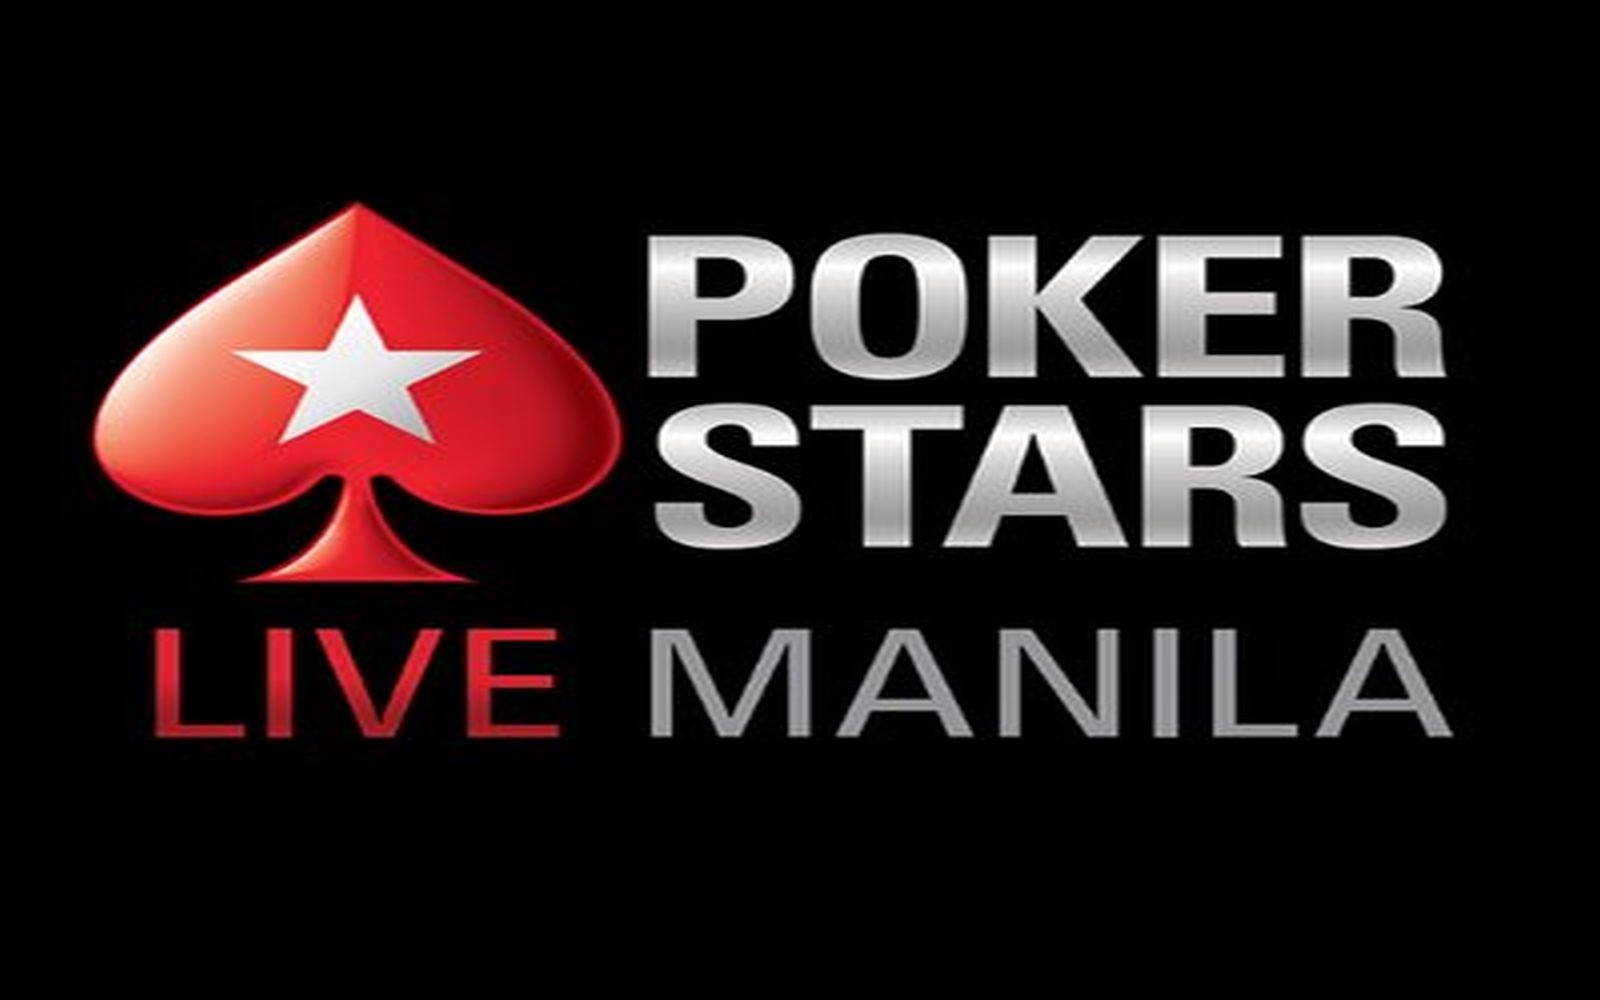 PokerStars Manila